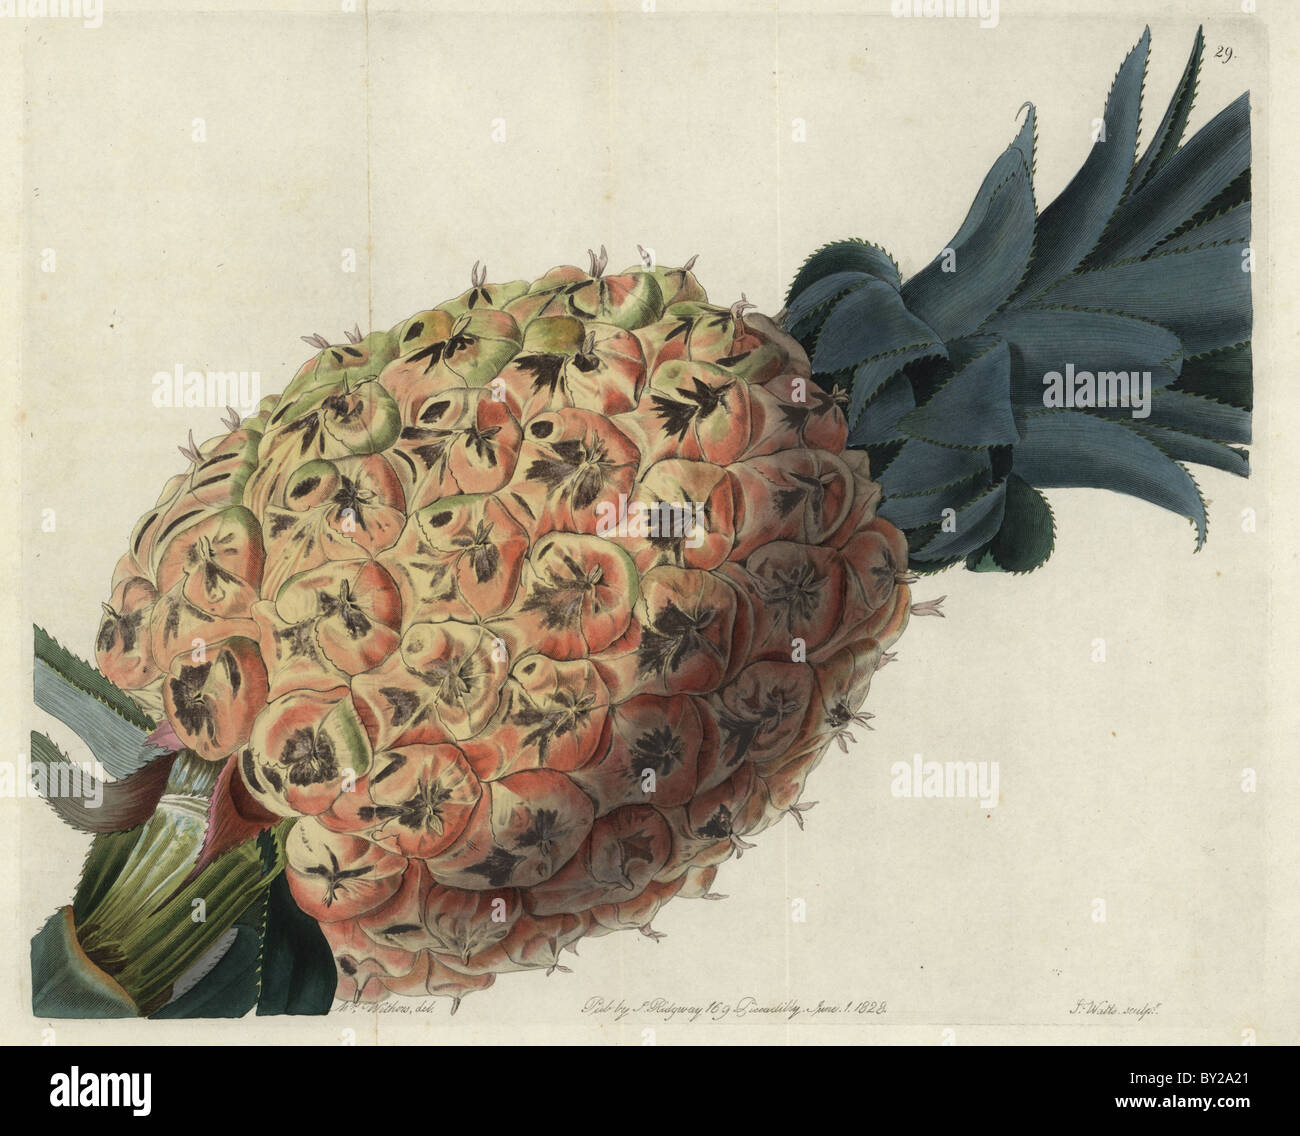 Otaheite o tahitian ananas, anson di pino, bromelia Ananas comosus. Immagini Stock